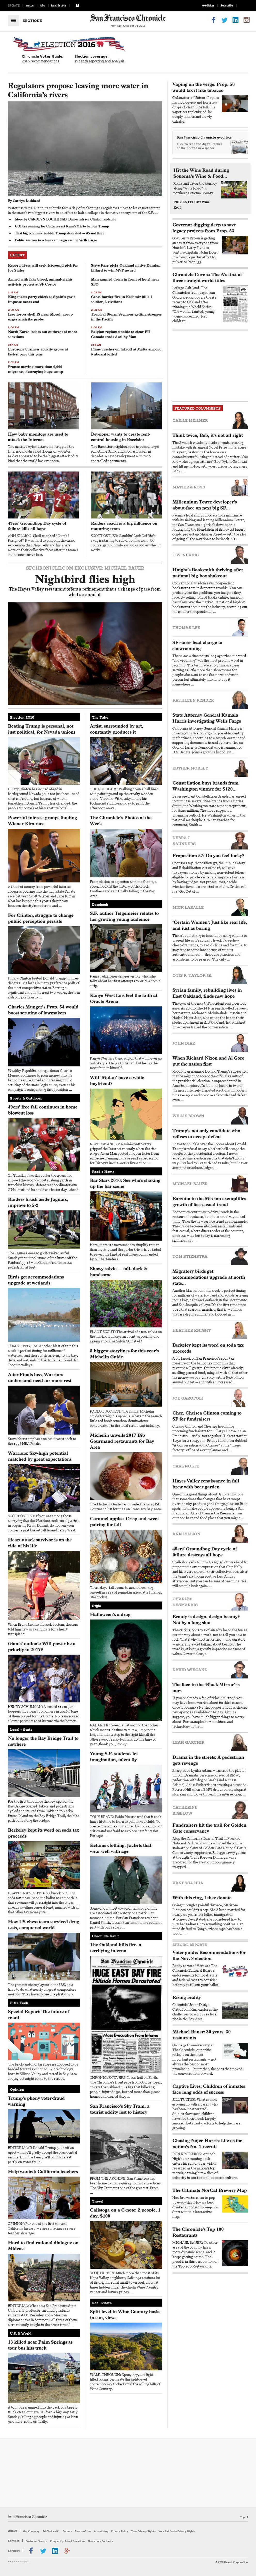 San Francisco Chronicle at Monday Oct. 24, 2016, 9:18 a.m. UTC